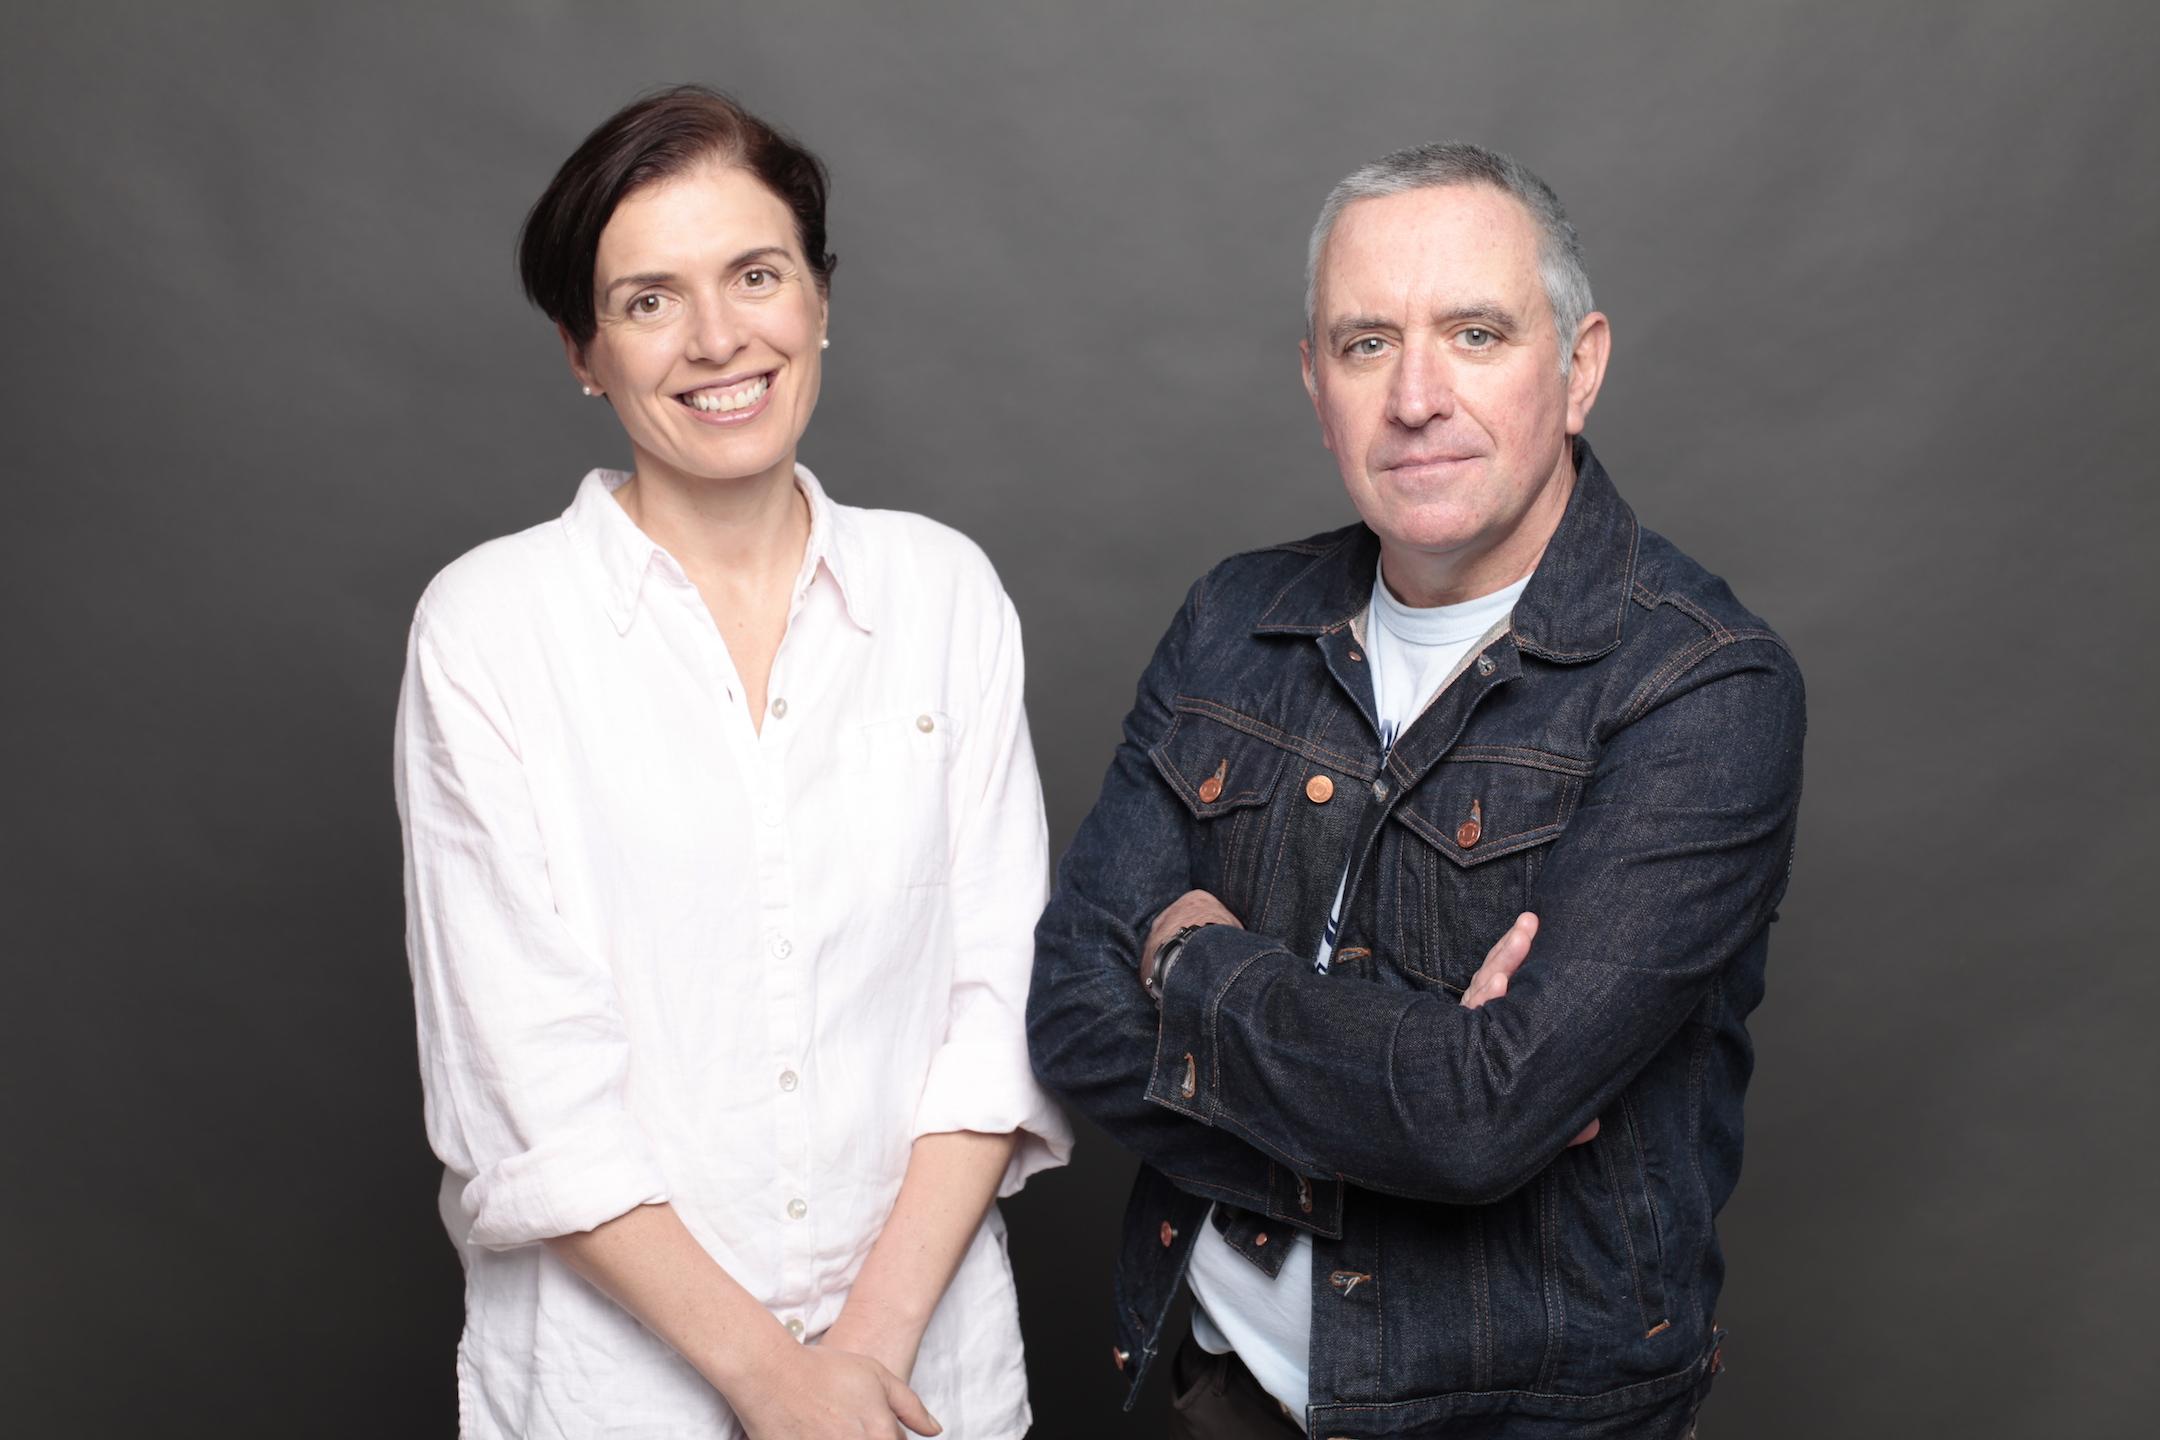 Chris Byrne and Diane Bell